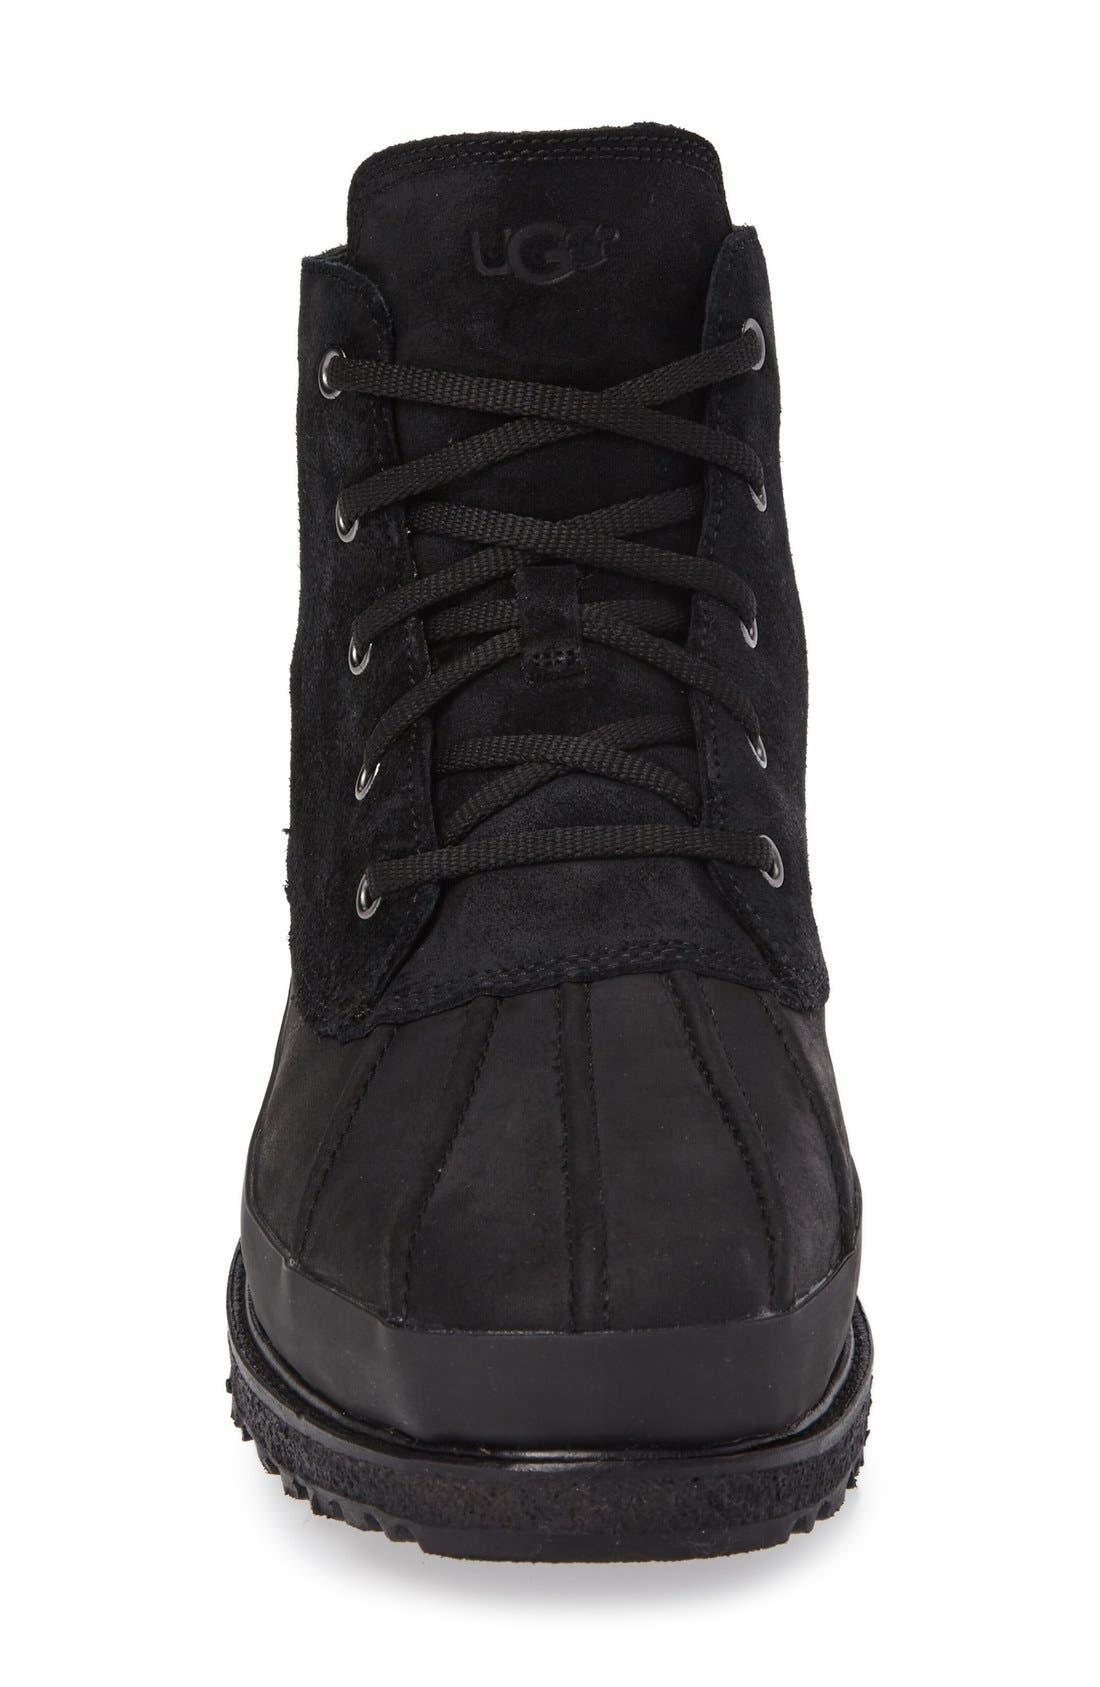 Fairbanks Waterproof Boot,                             Alternate thumbnail 3, color,                             Black